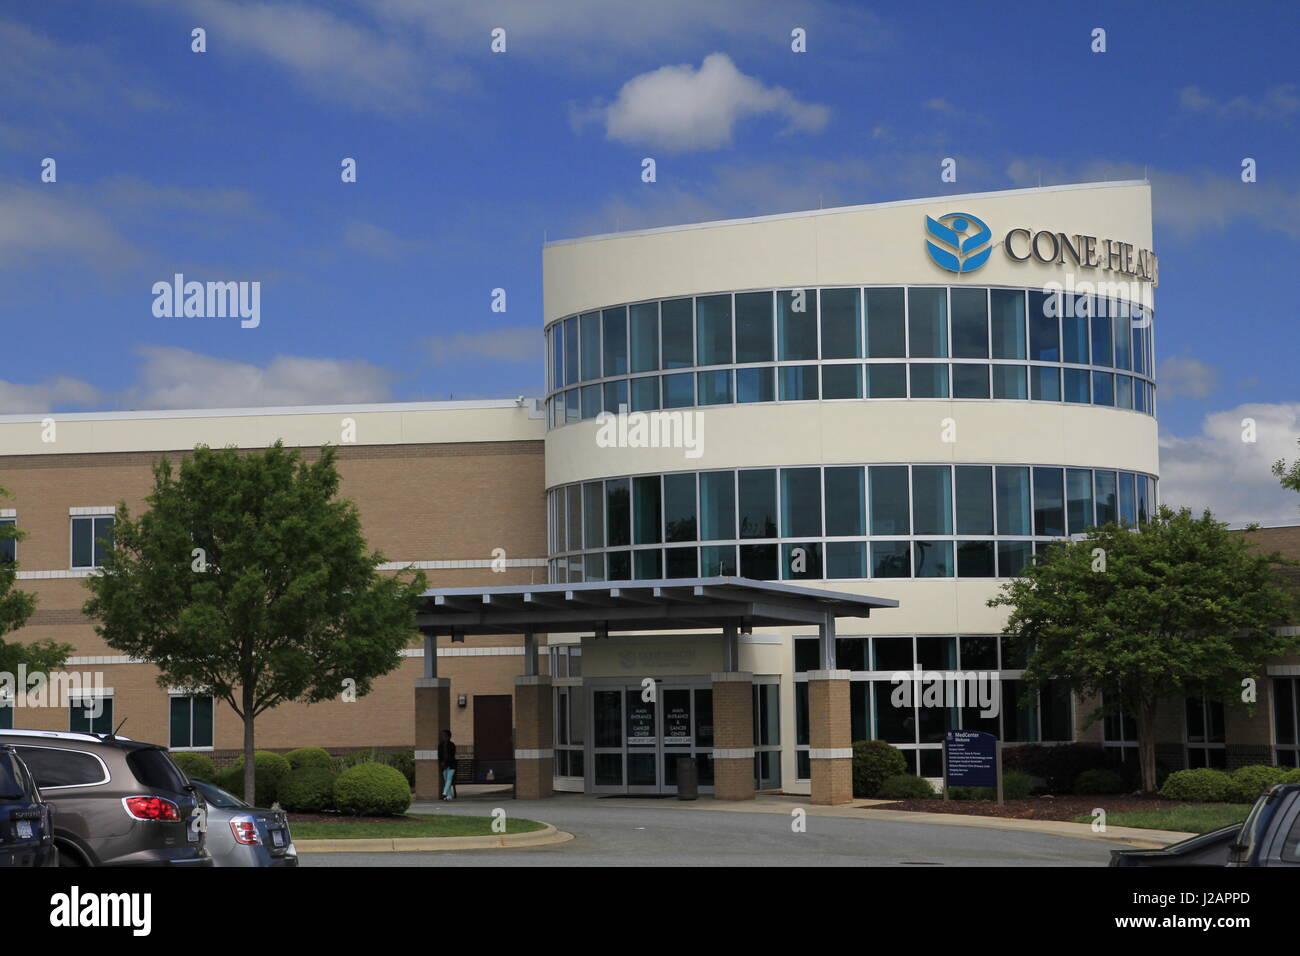 Cone Health Medical Mebane North Carolina - Stock Image